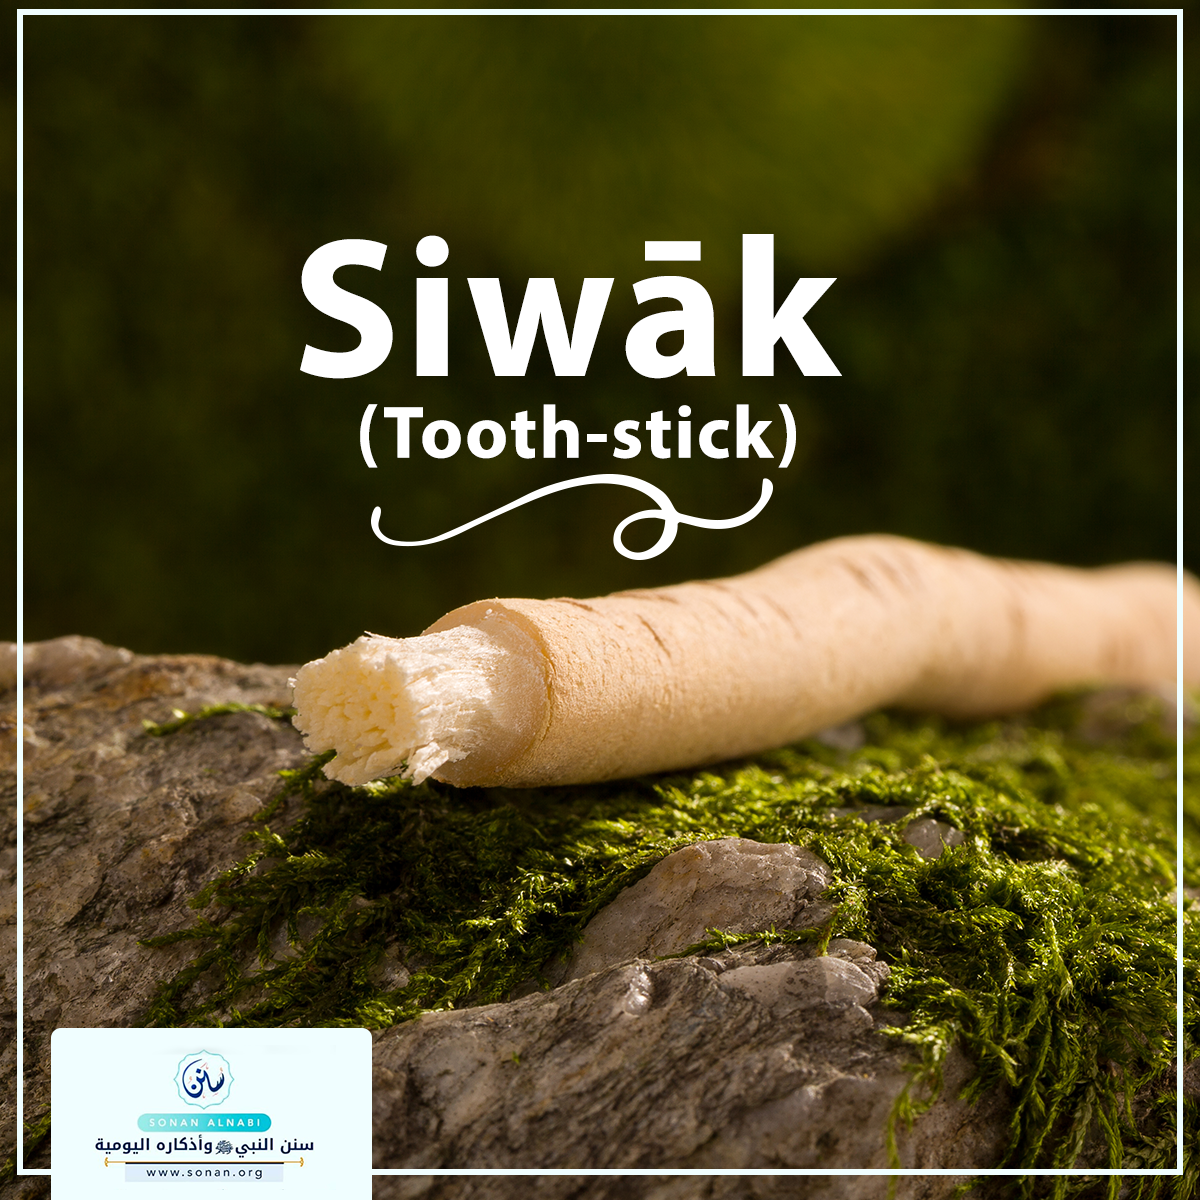 Siwāk (Tooth-stick